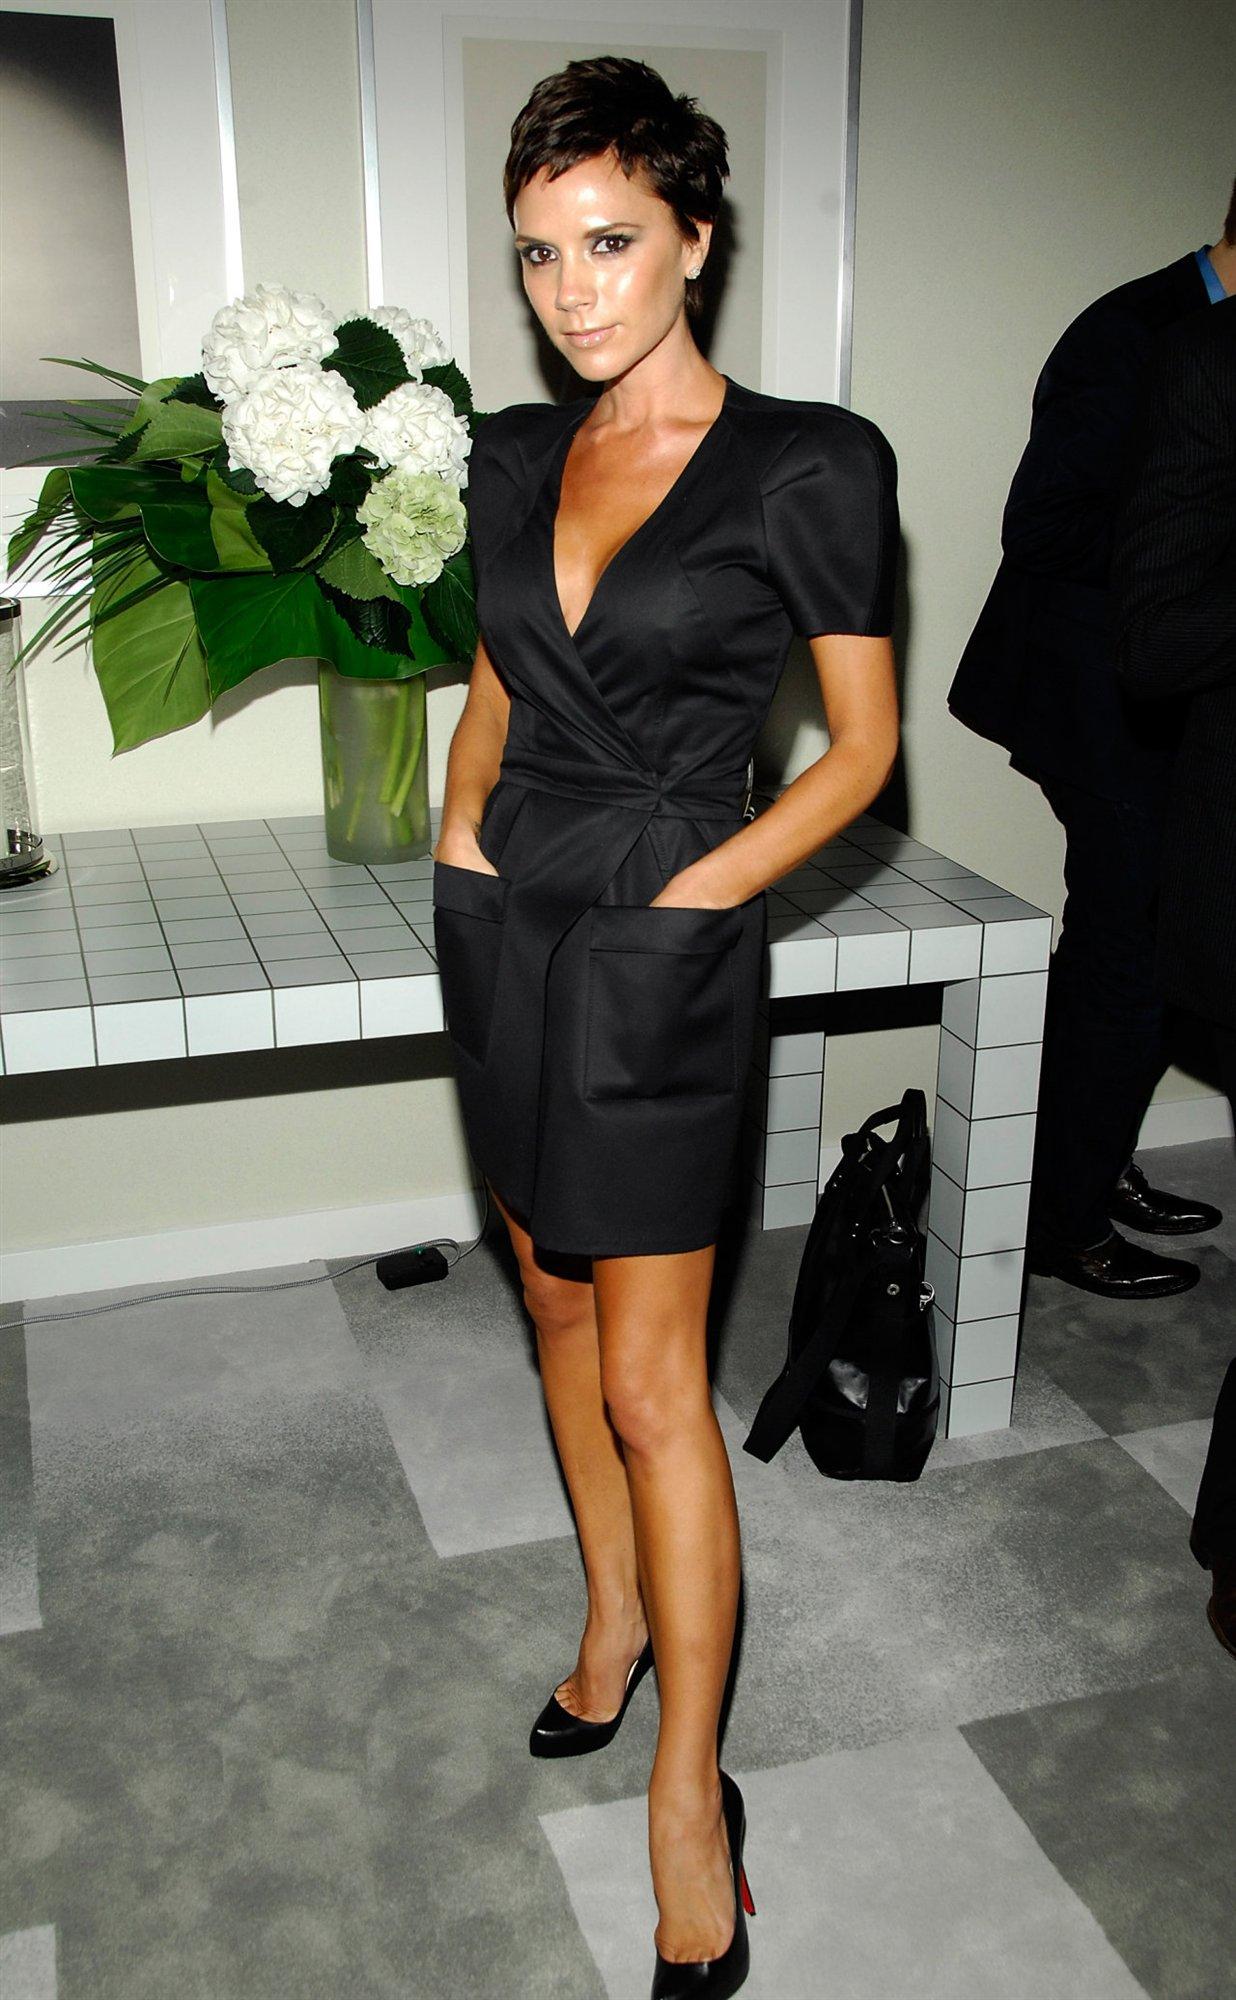 Victoria Beckham Hot Actress  SheClickcom